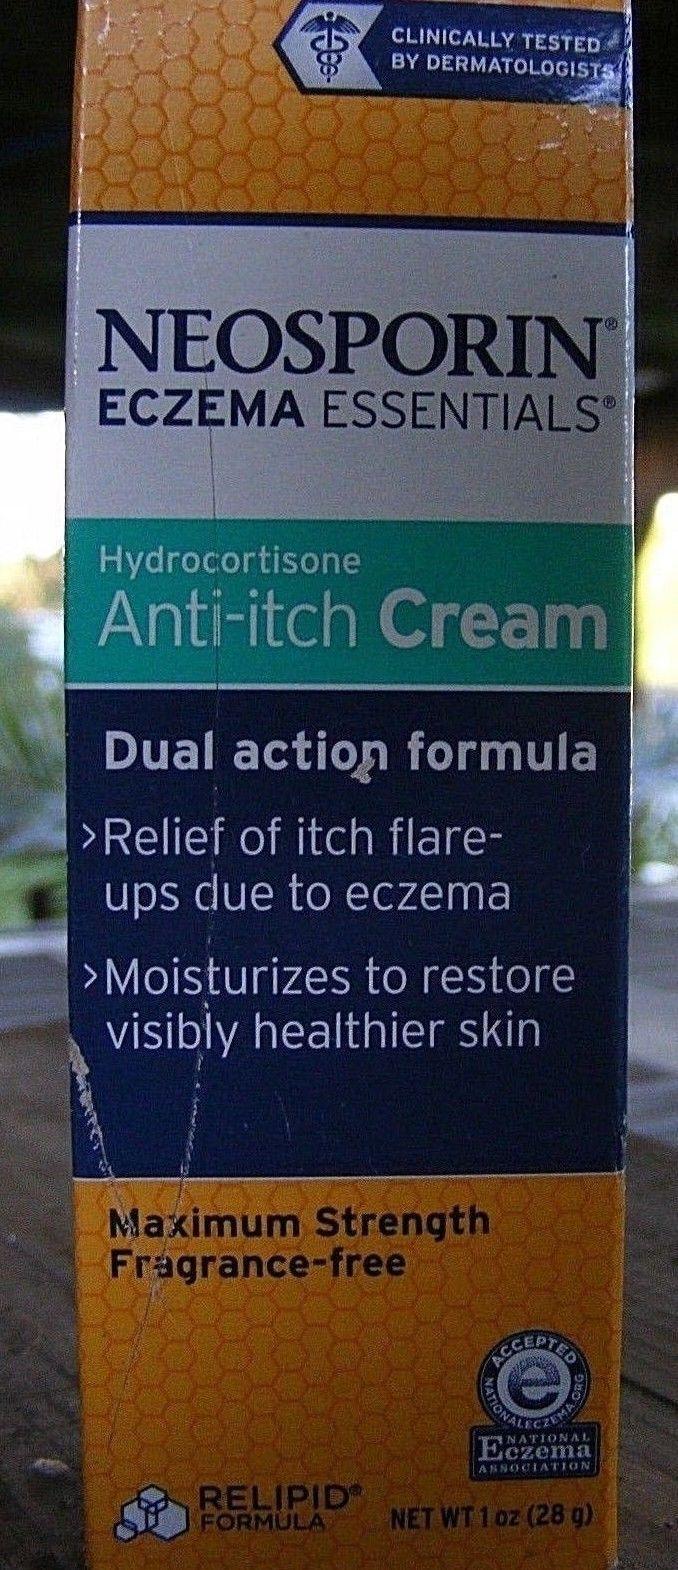 Neosporin Eczema Essentials Hydrocortisone and 50 similar items